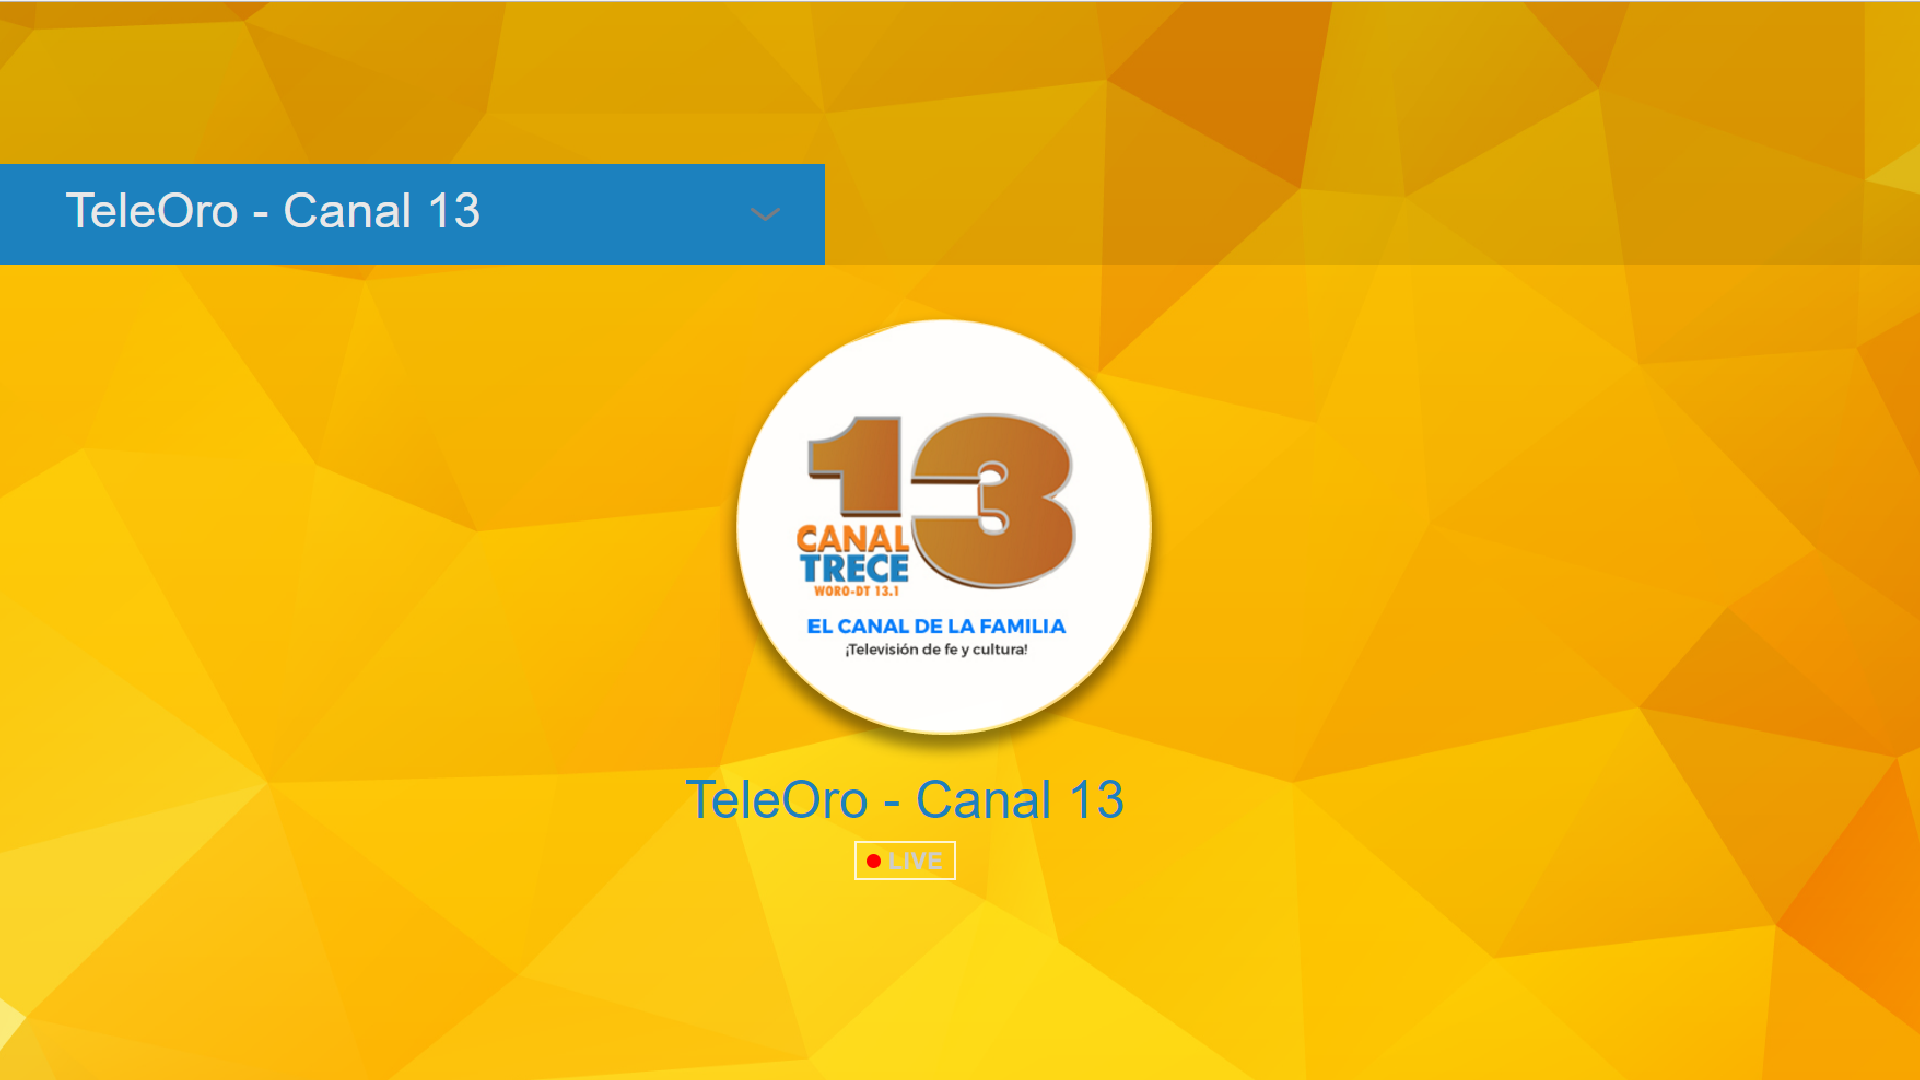 TeleOro - Canal 13: Amazon.es: Appstore para Android